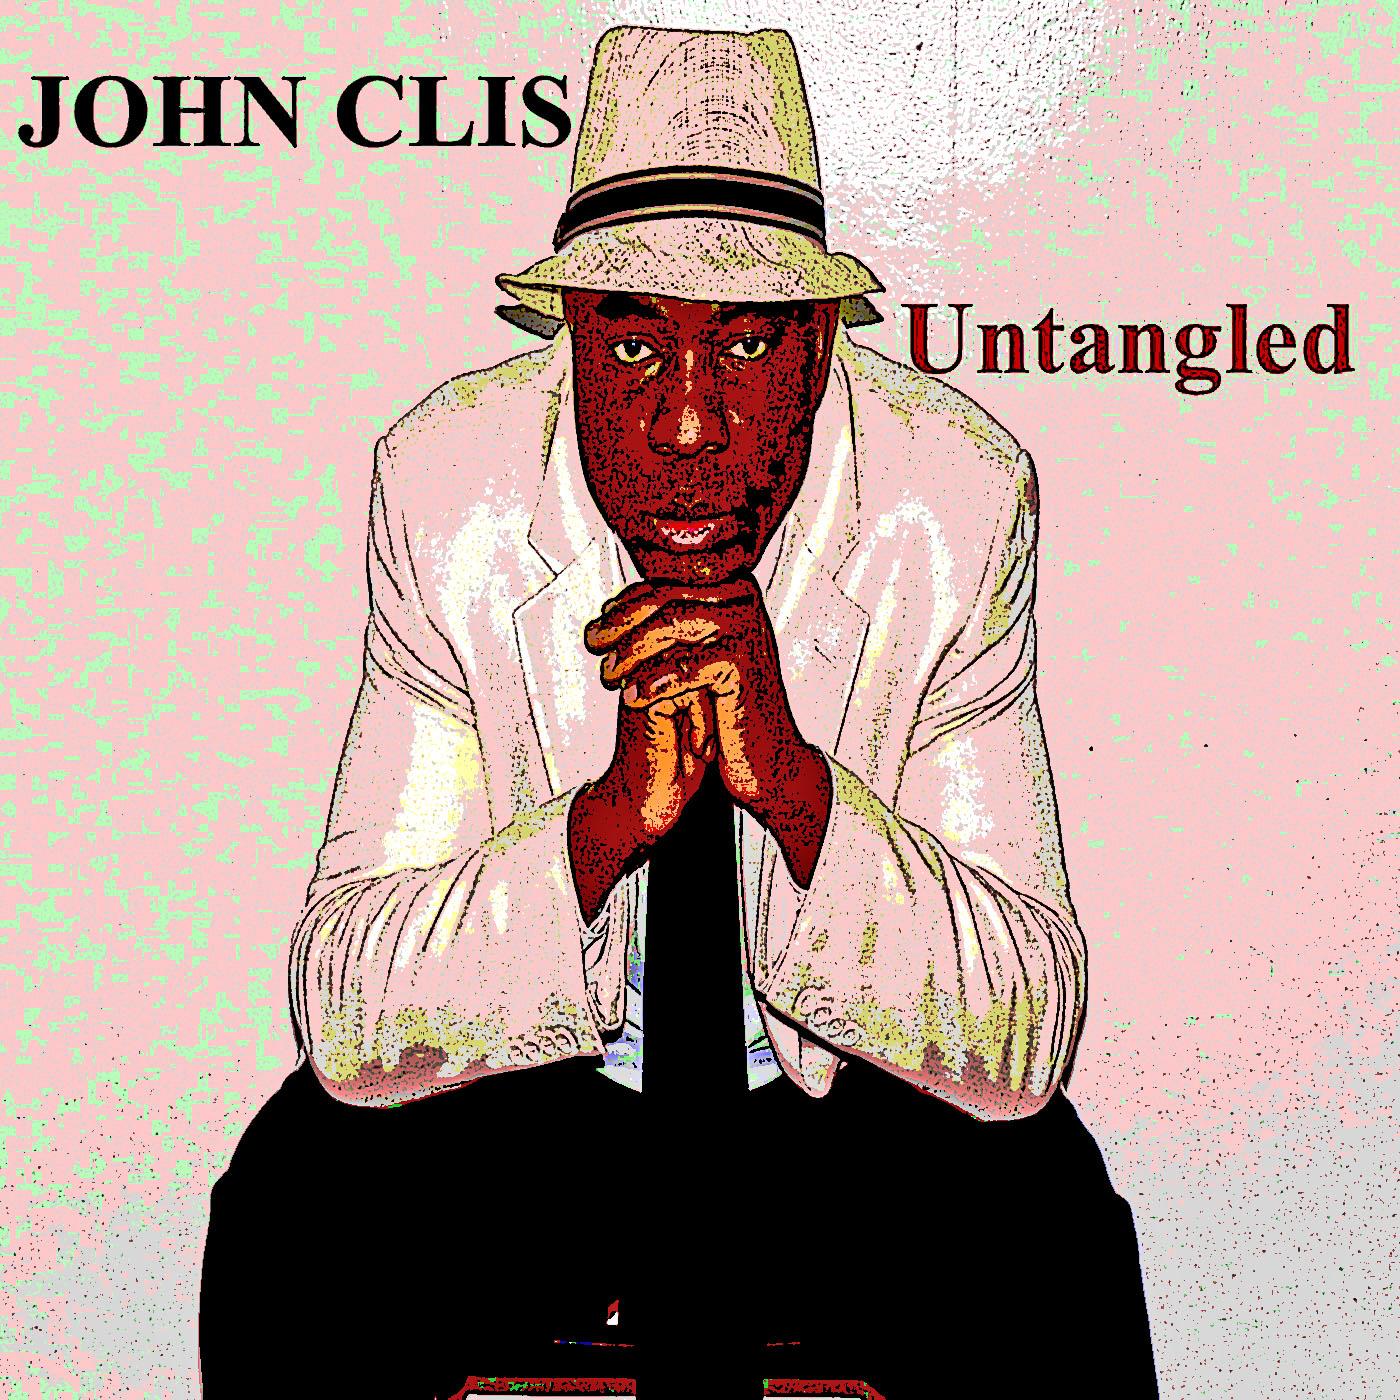 https://0201.nccdn.net/1_2/000/000/112/b4d/John-Clis---Untangled---Photo.jpg